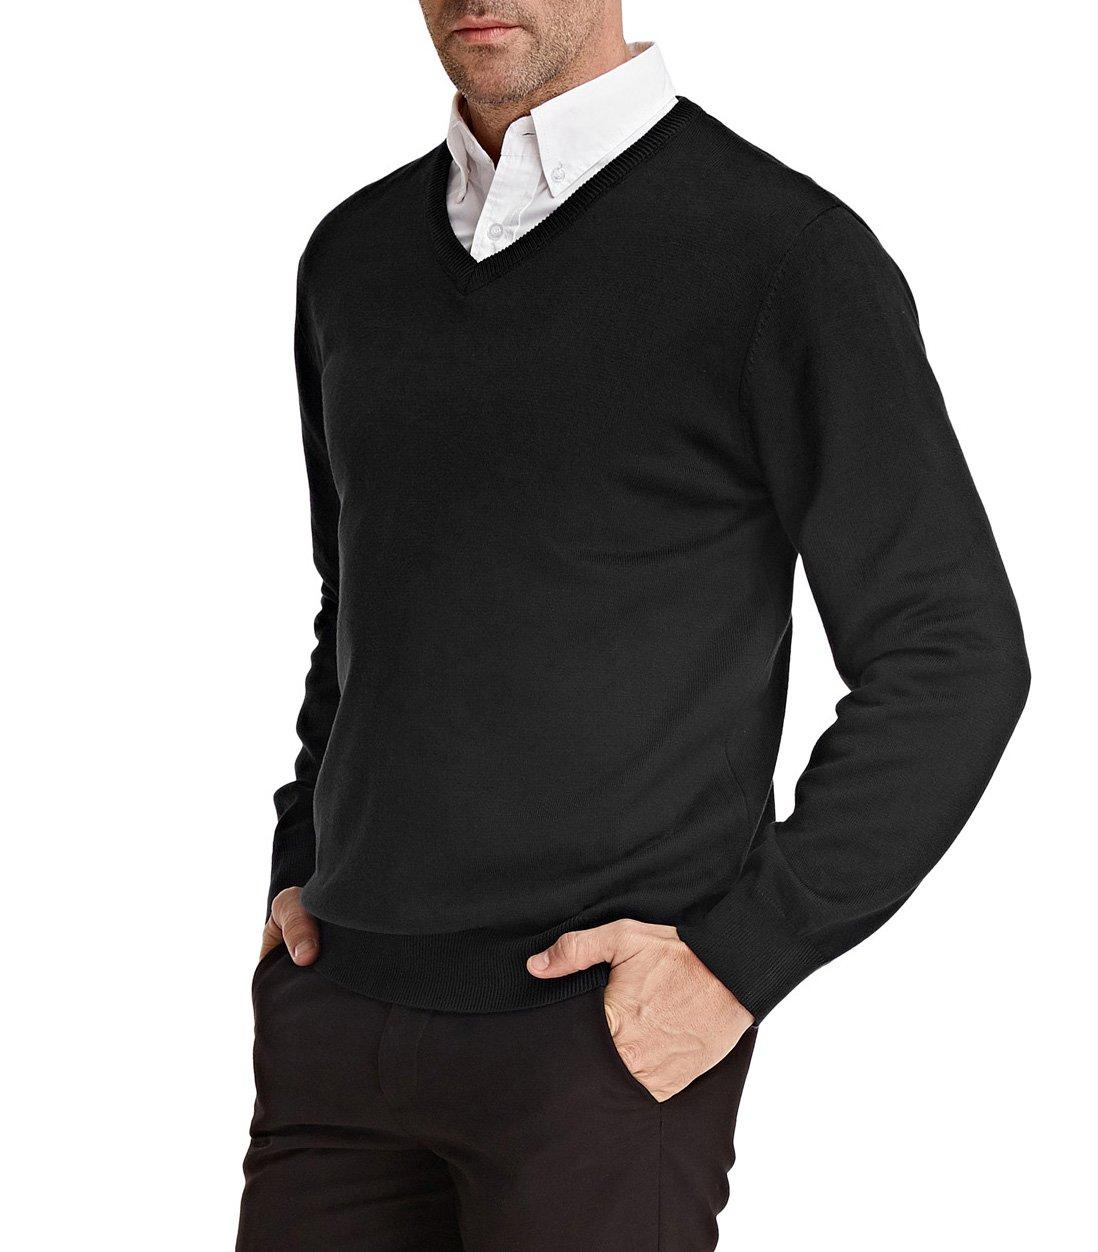 PAUL JONES Men's Slim Fit Pullover Sweater Cotton Lightweight Size XL Black by PAUL JONES